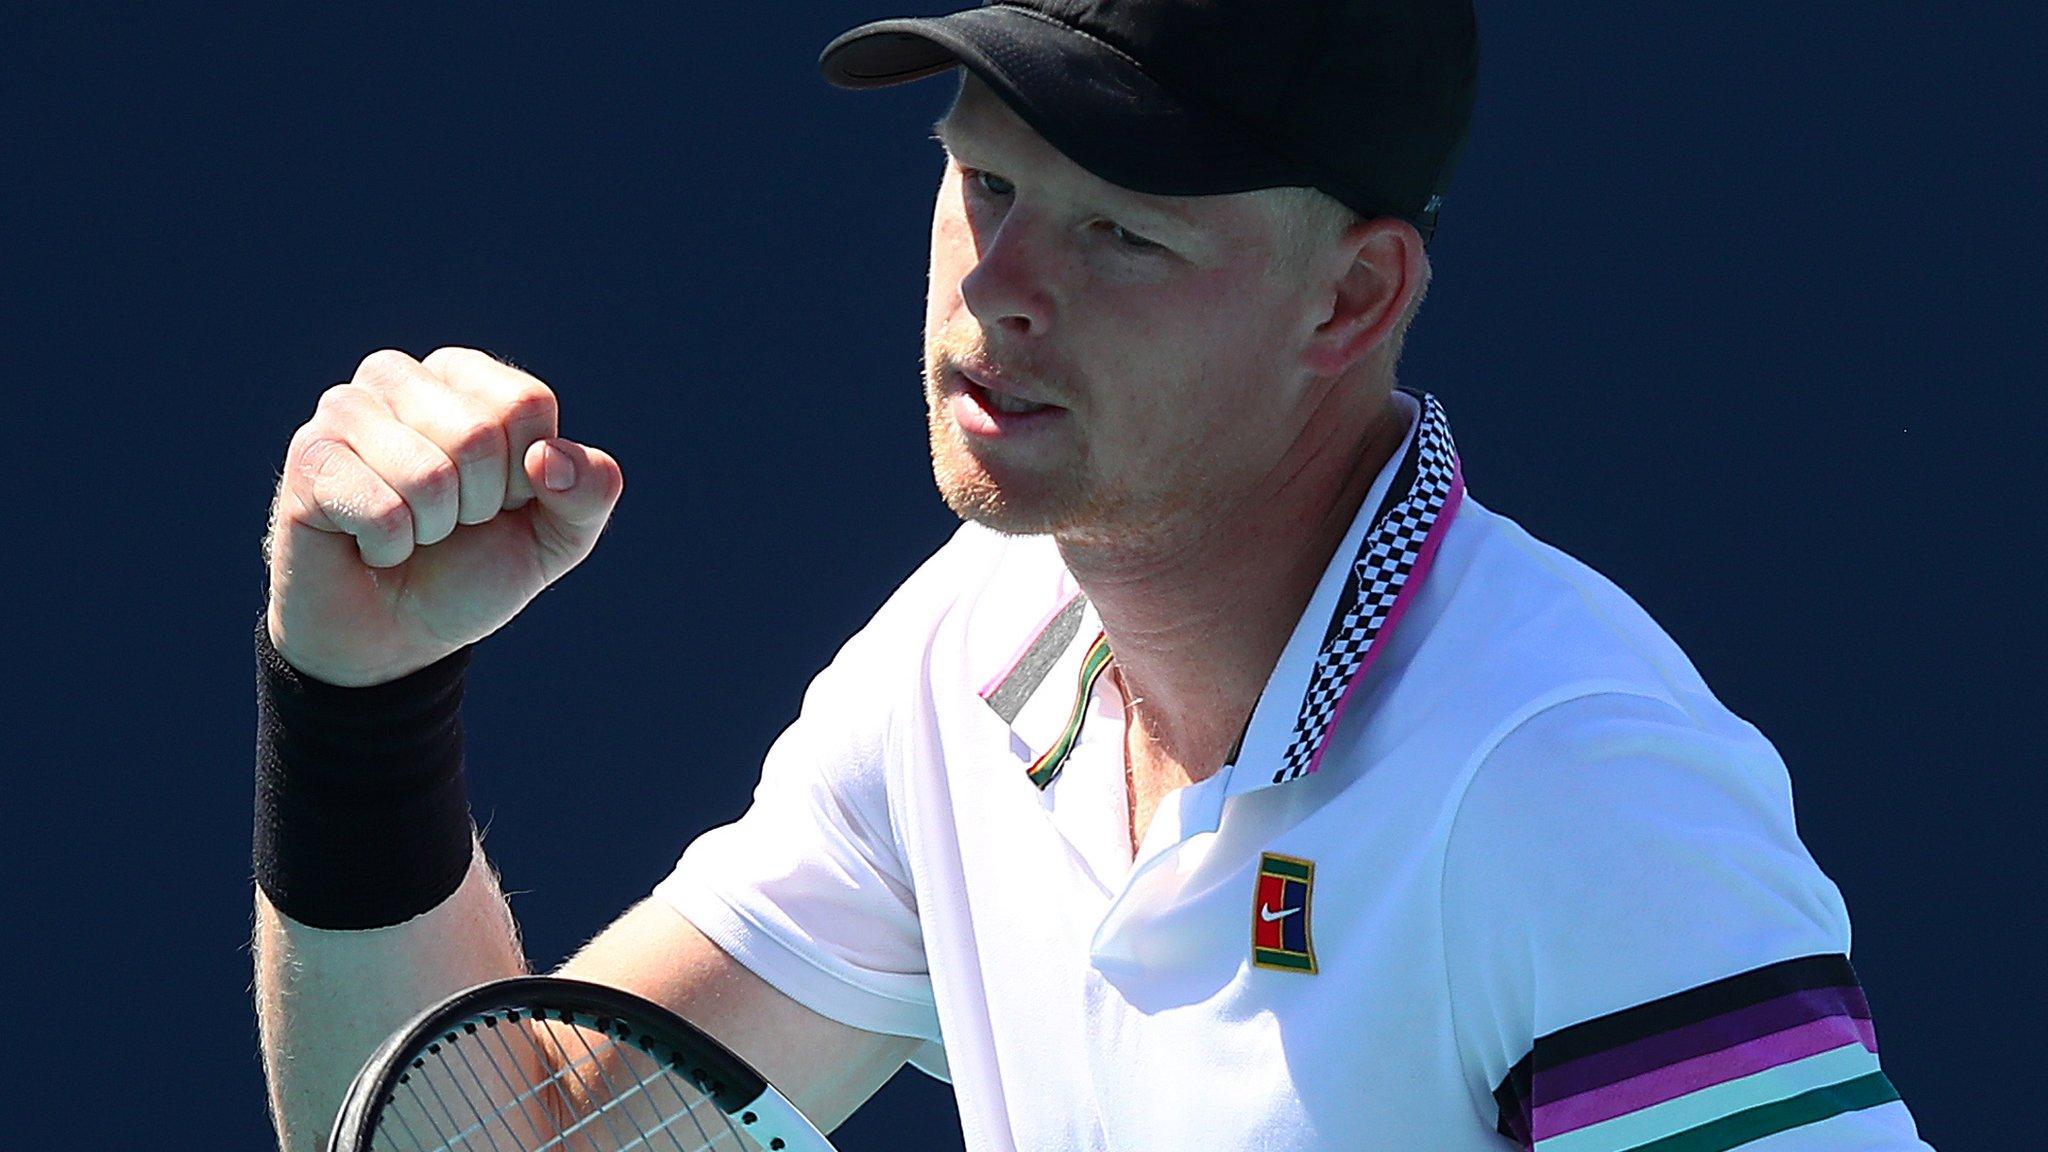 Miami Open: Kyle Edmund beats Ilya Ivashka to reach the third round